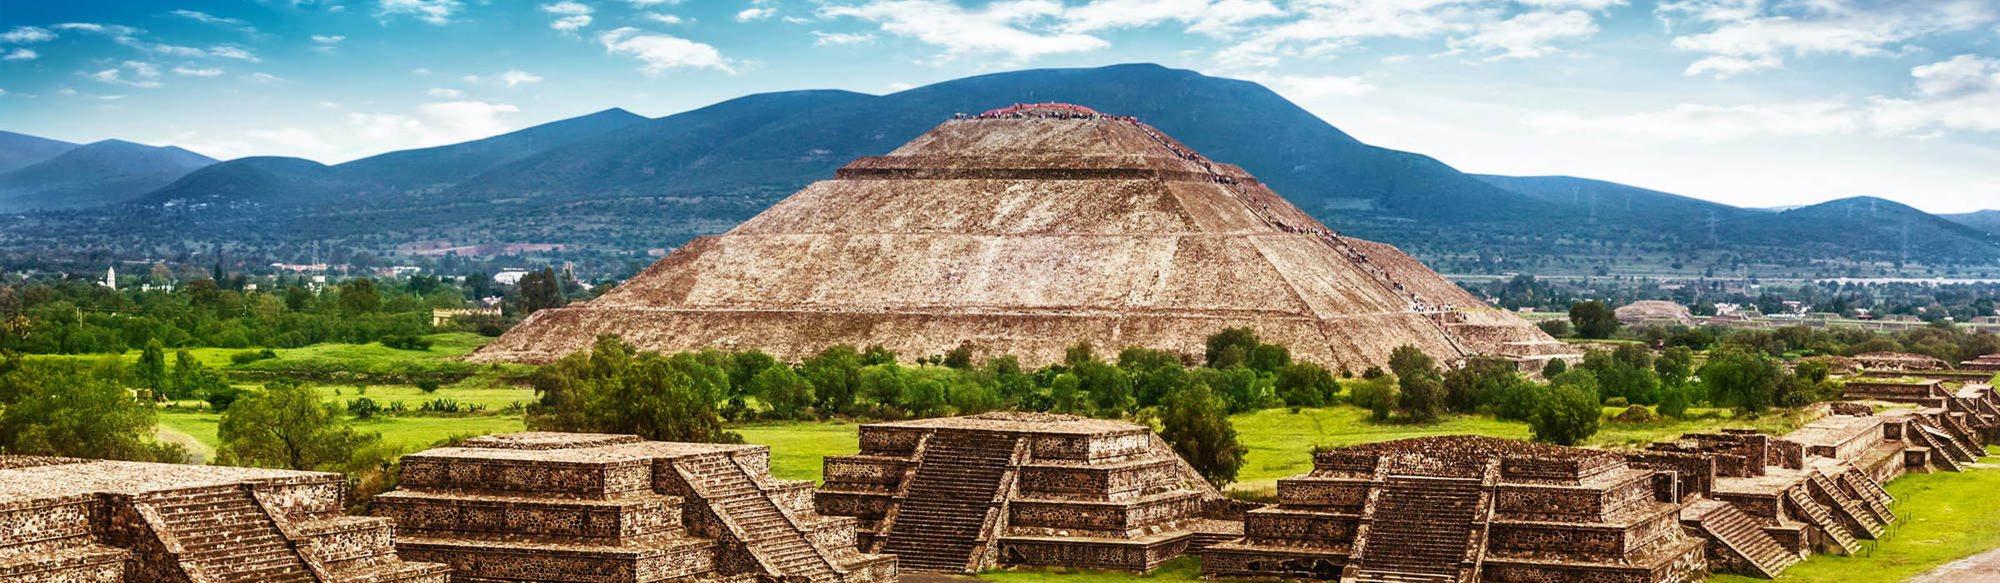 Mexikanske kultur dating